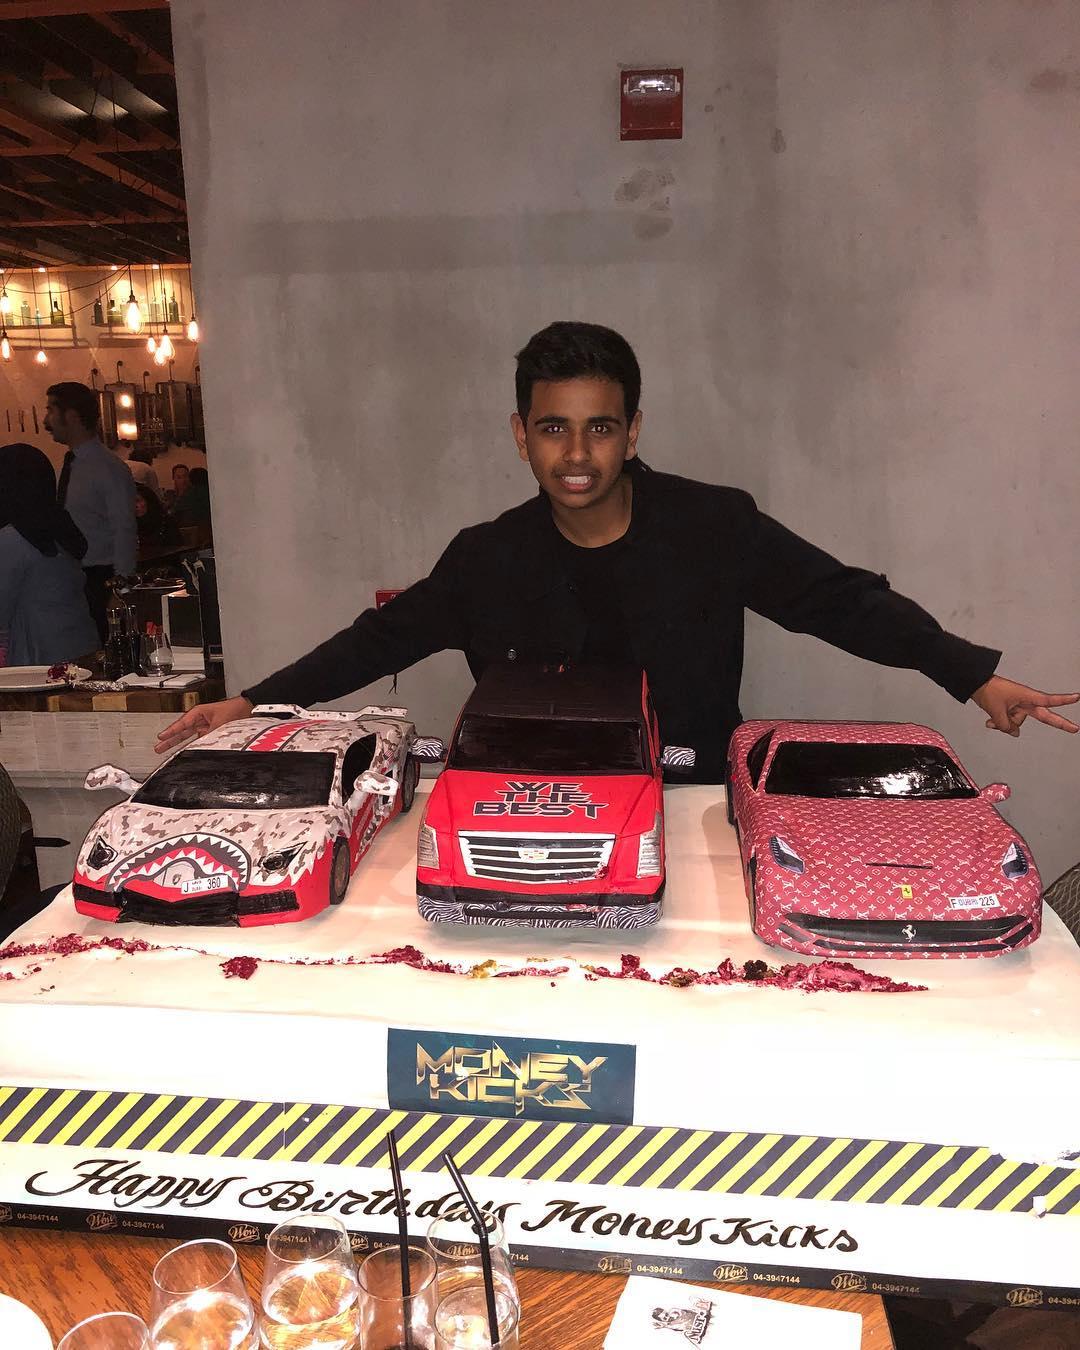 Richest Kid In Dubai >> Photo Of The Day Dubai Richest Kid Money Kicks 16th Birthday Cake